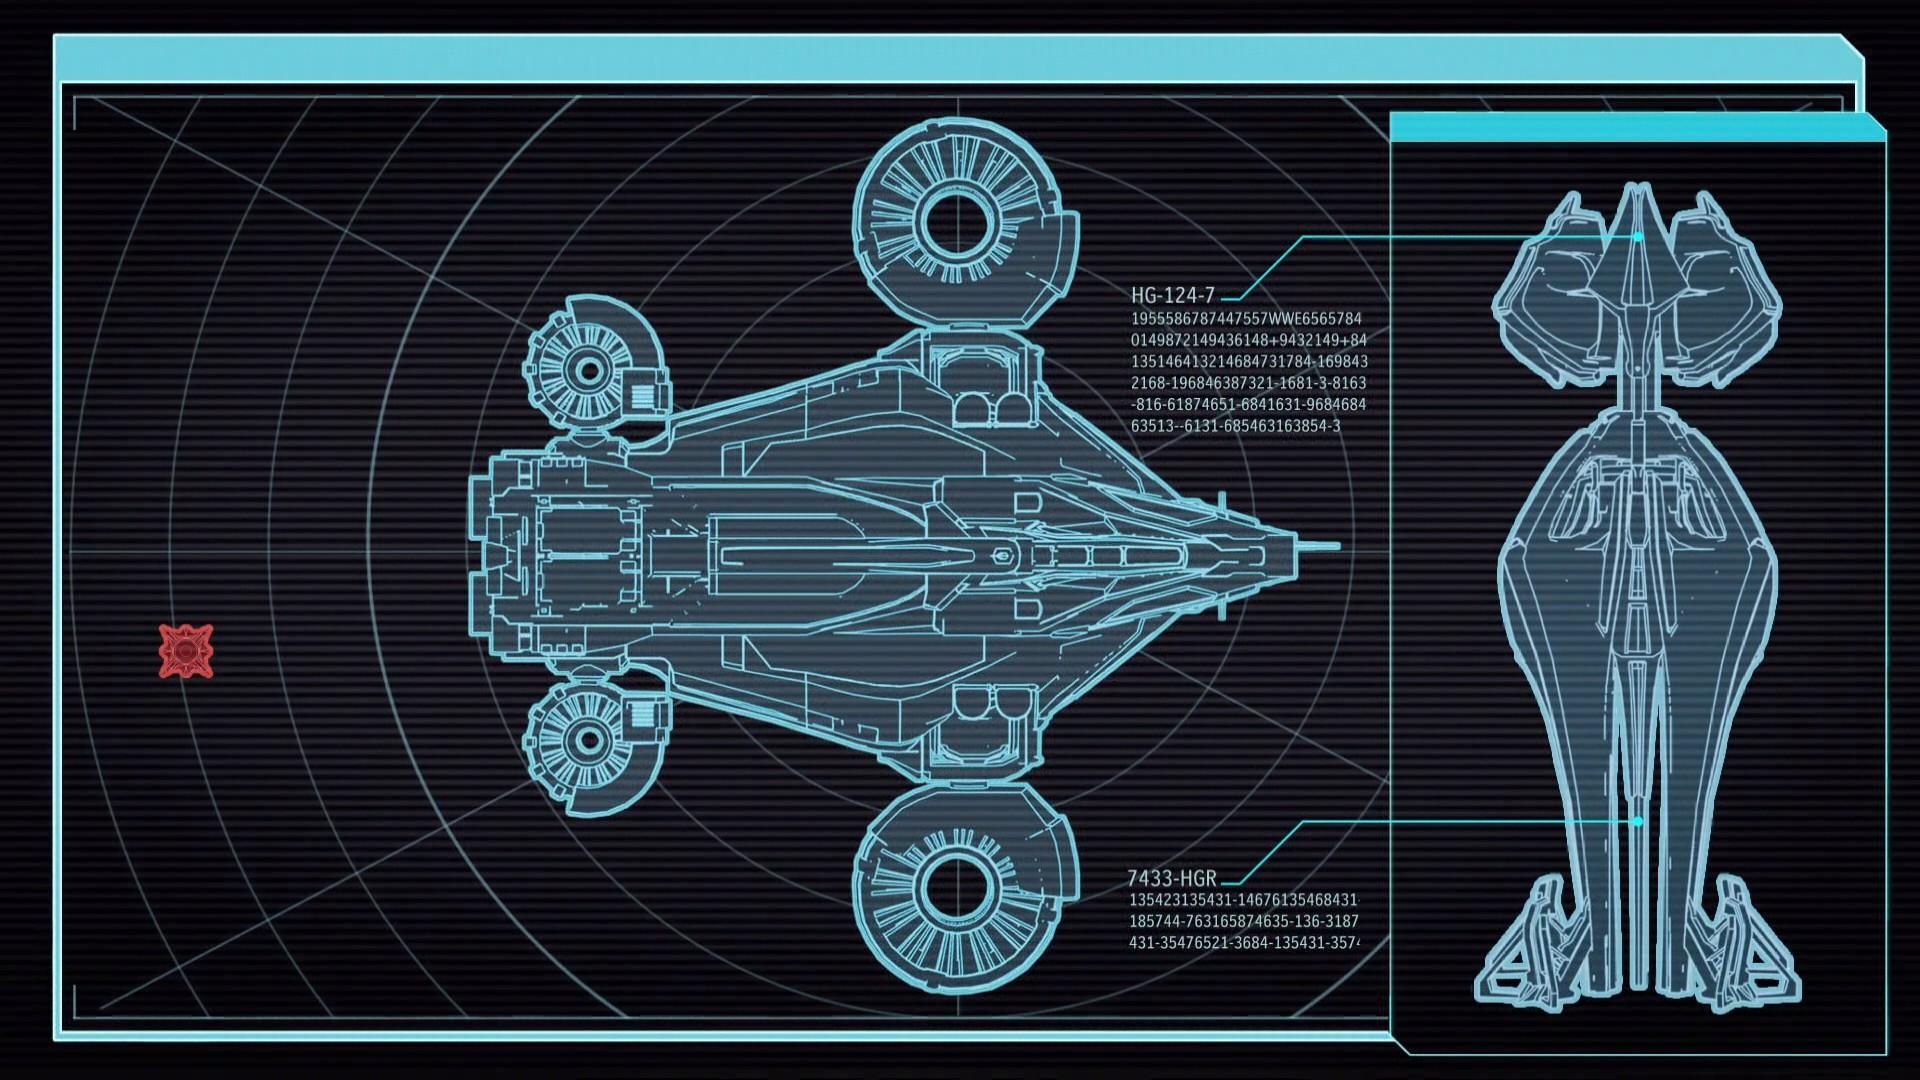 avenger defense xcom wiki fandom powered by wikia. Black Bedroom Furniture Sets. Home Design Ideas